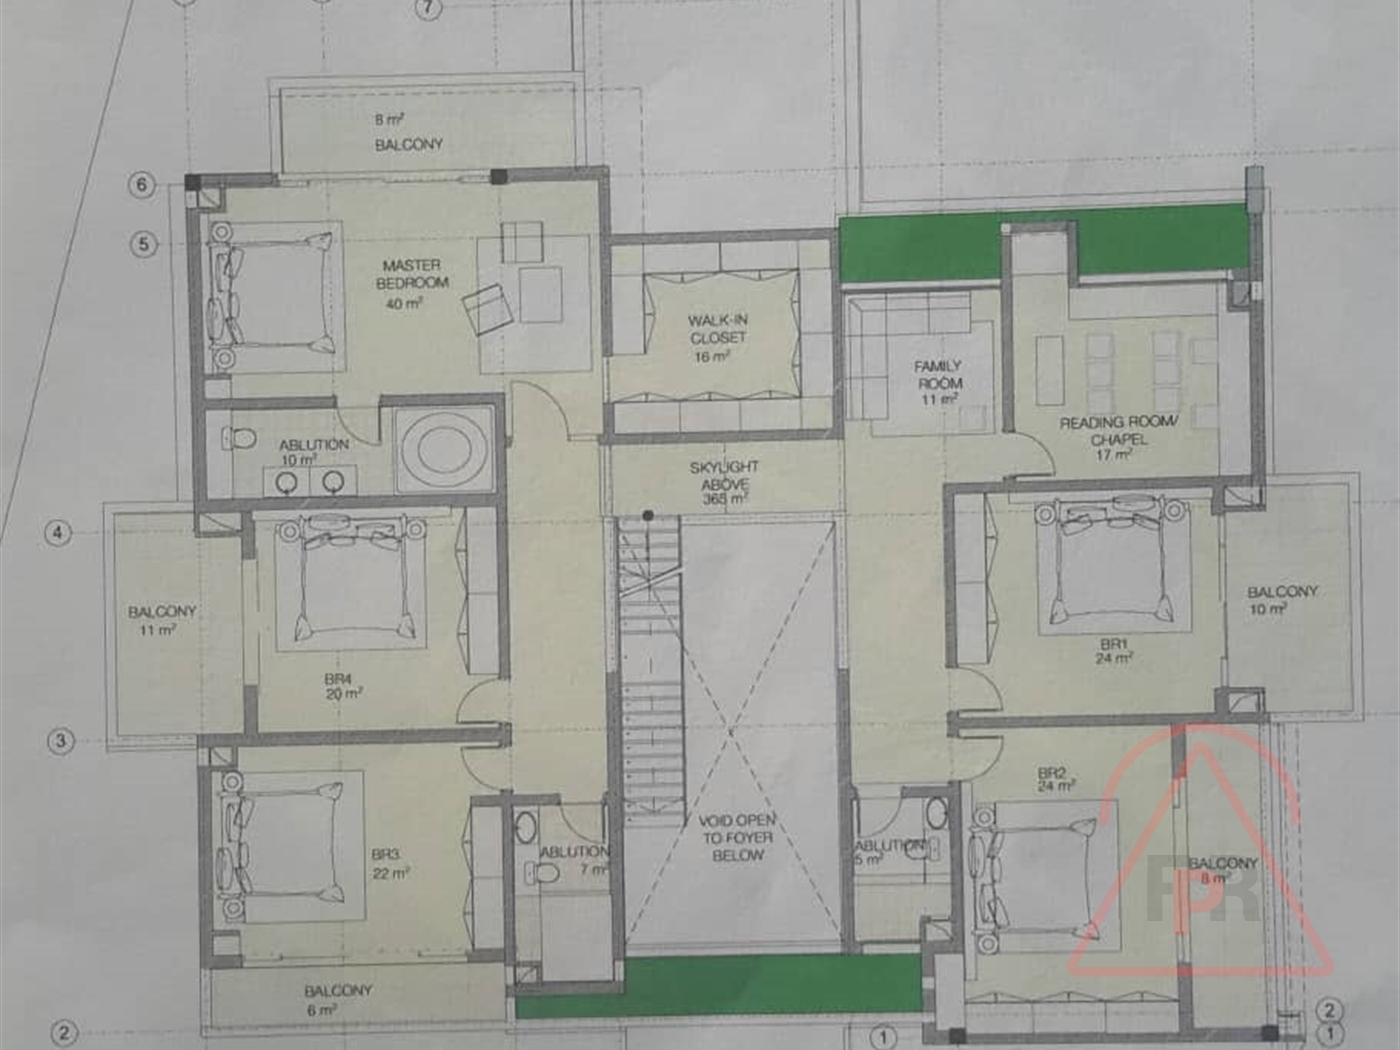 Floor/House plan